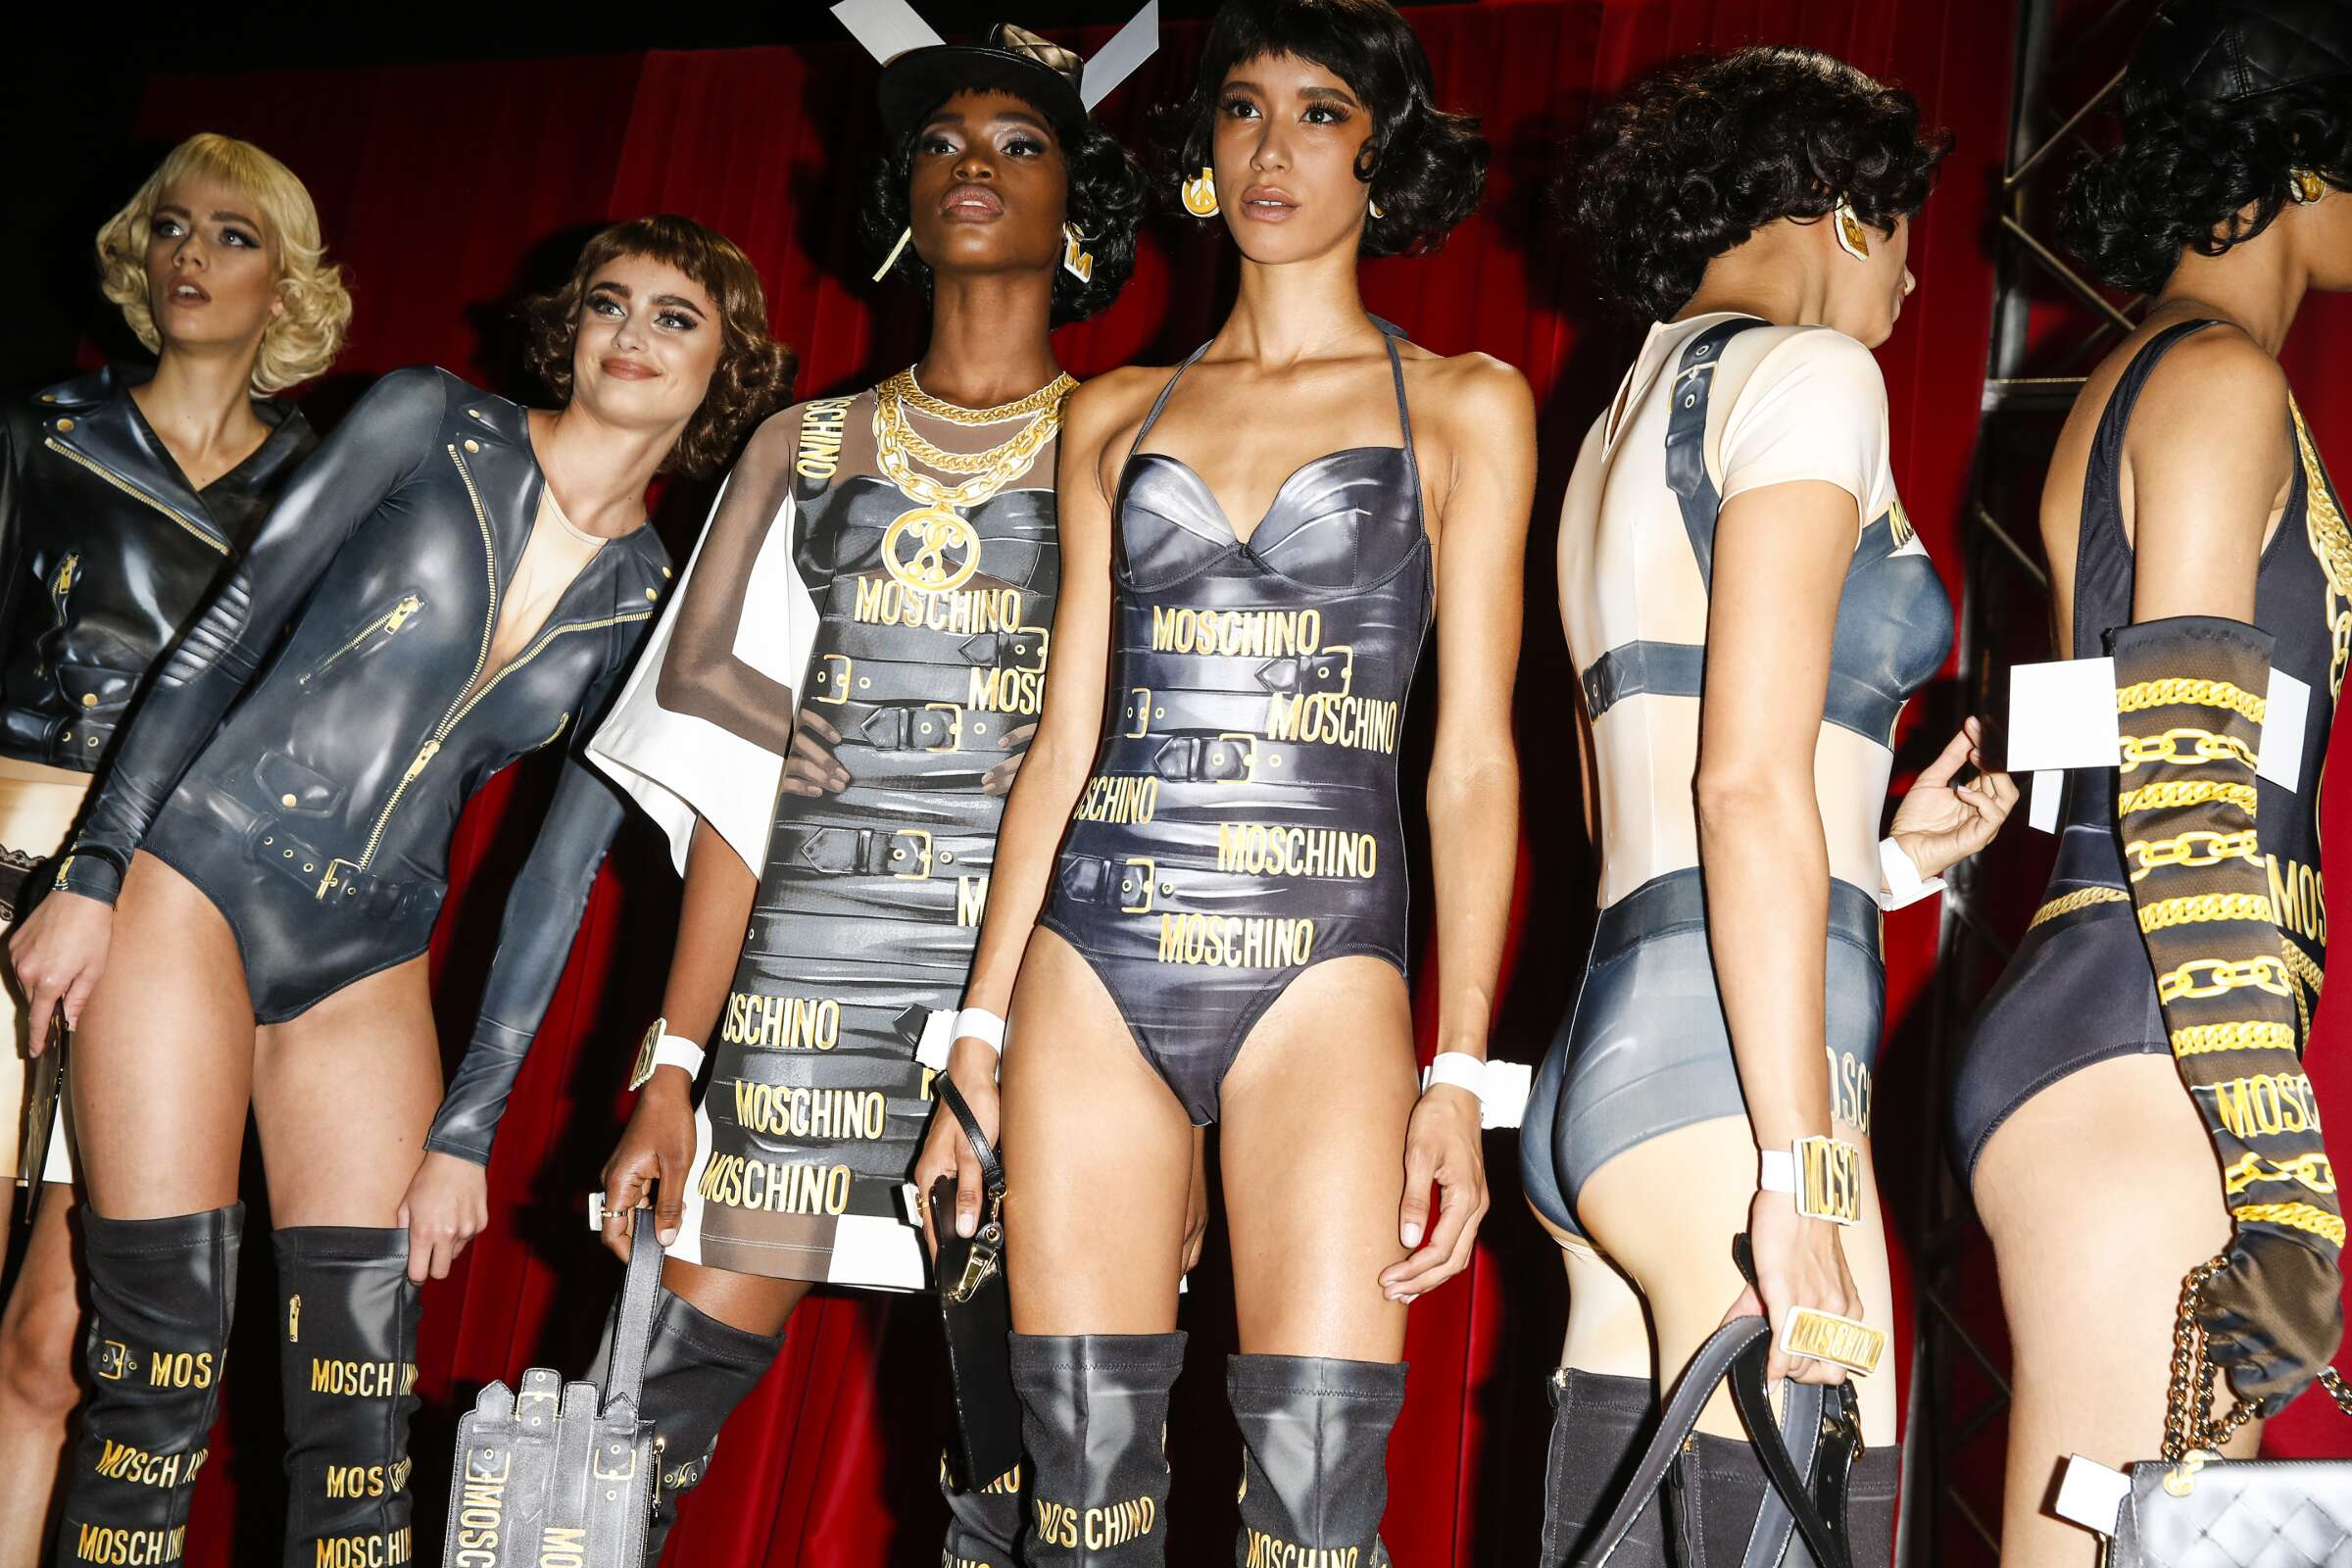 Backstage Women Moschino Models